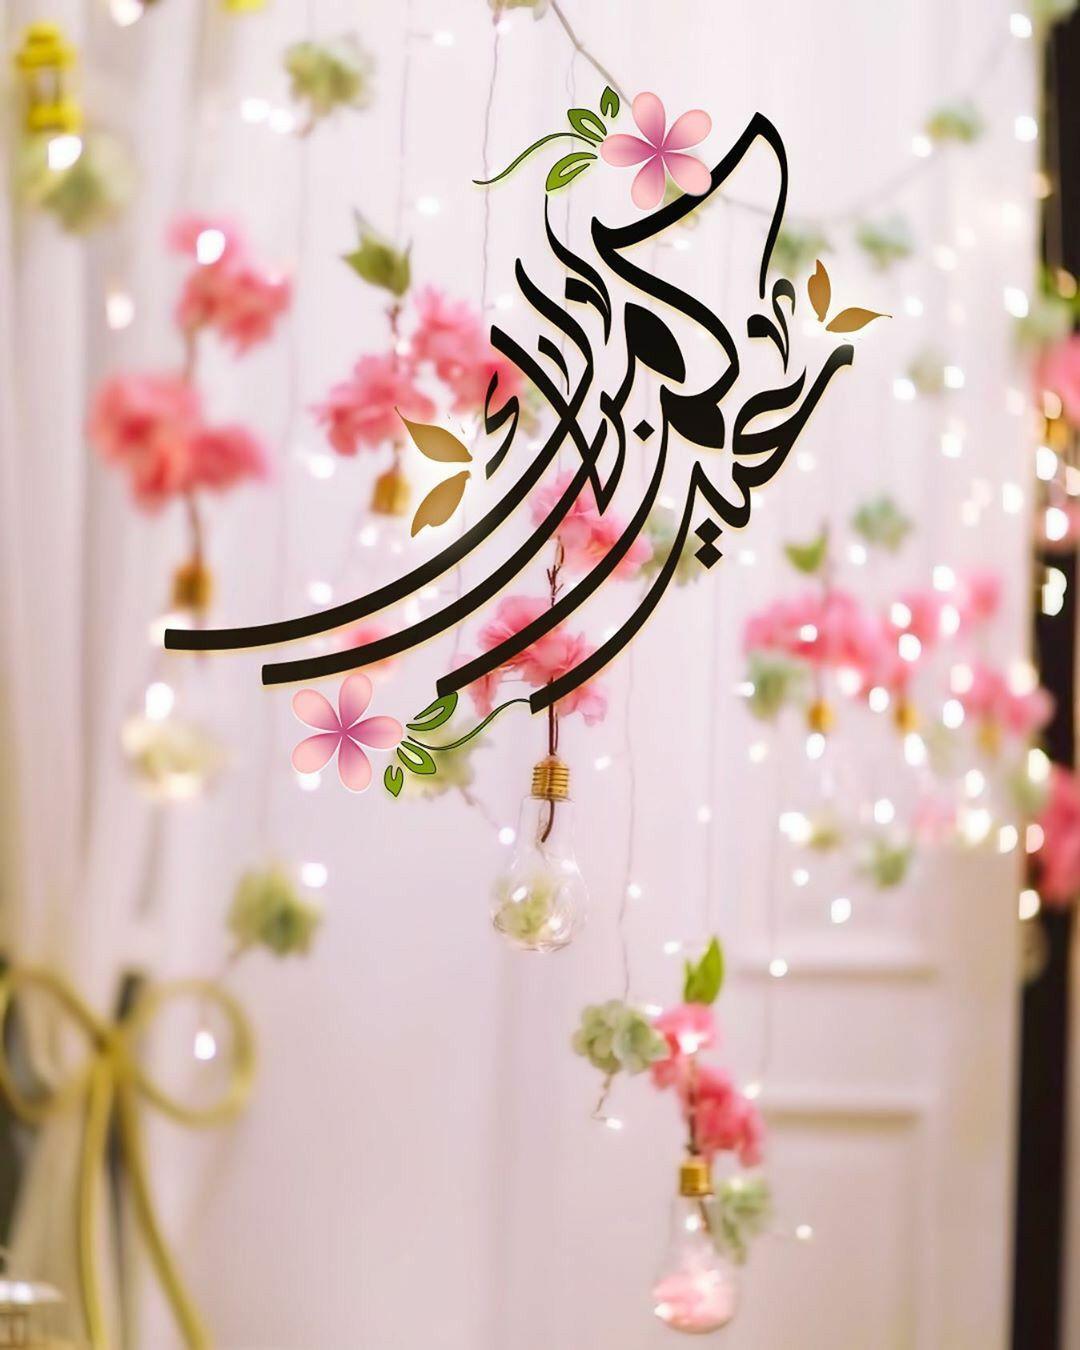 Pin By Moses Moudy On تهاني العيد الفطر المبارك لعام ١٤٤٠ Ramadan Lantern Ramadan Sweets Eid Mubarik